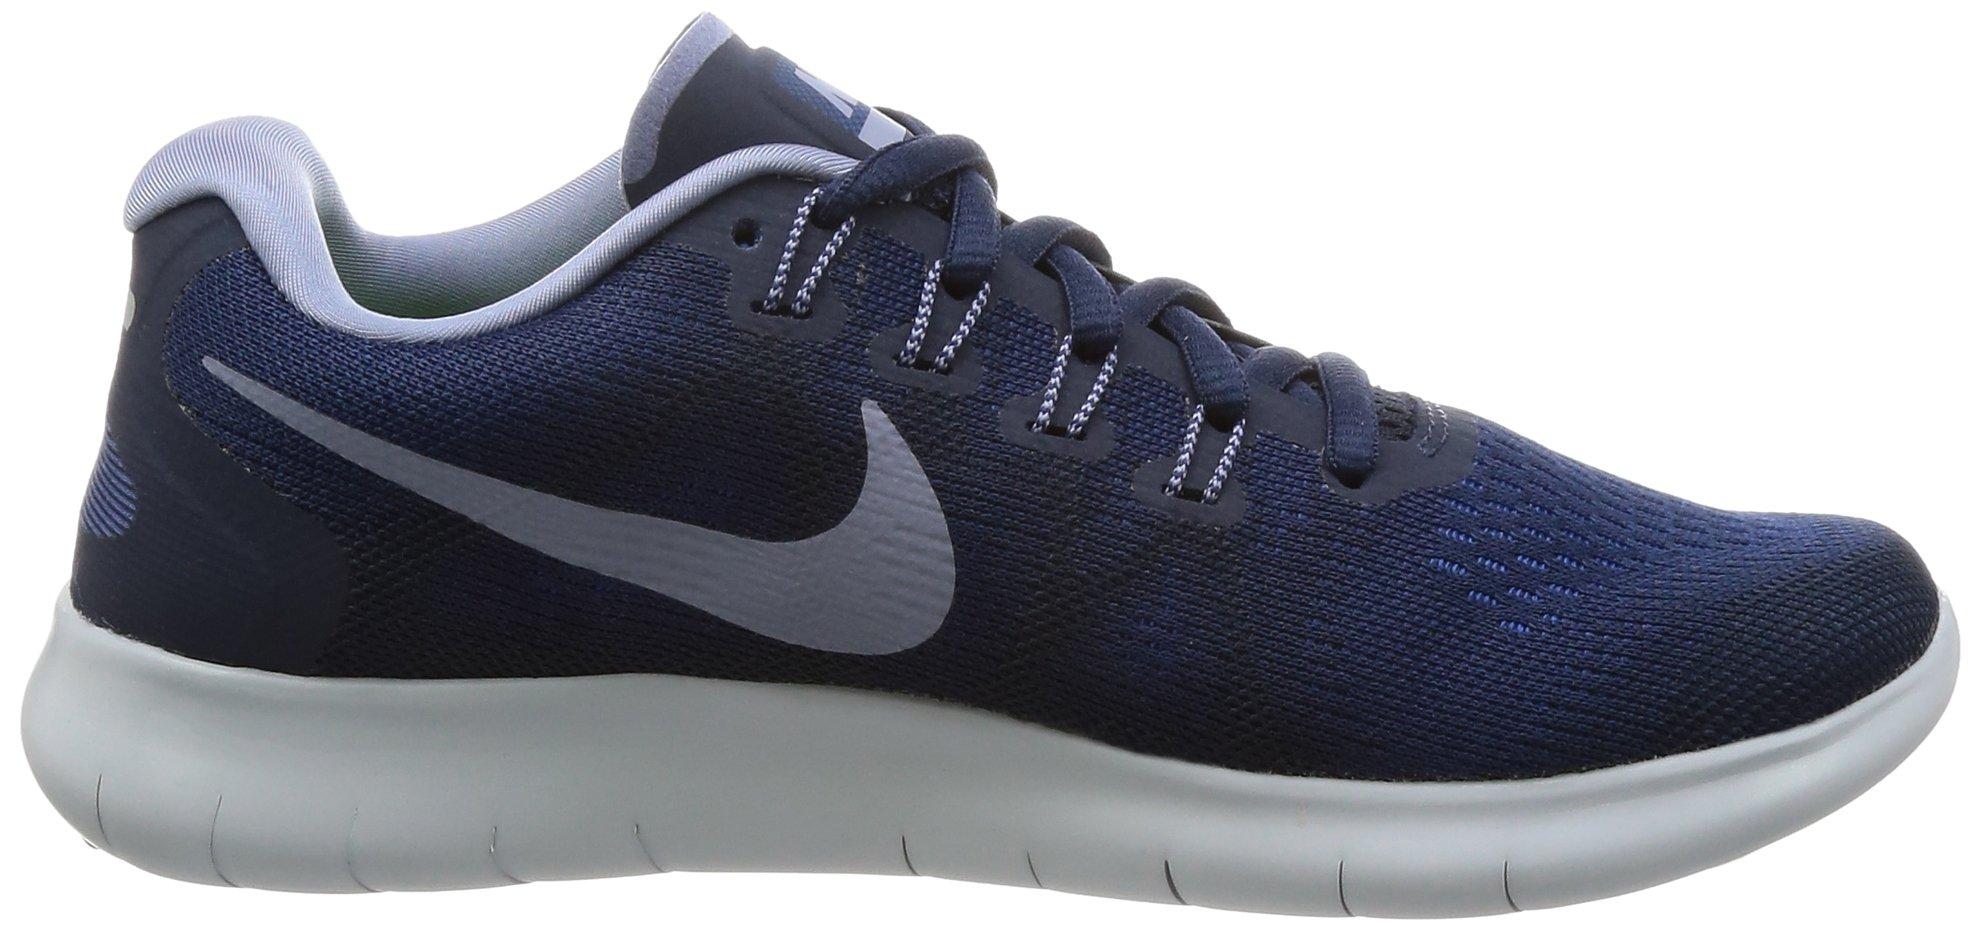 Nike Free RN 2017 Women's Running Shoes (6 M US, Binary Blue/Dark Sky Blue) by Nike (Image #6)